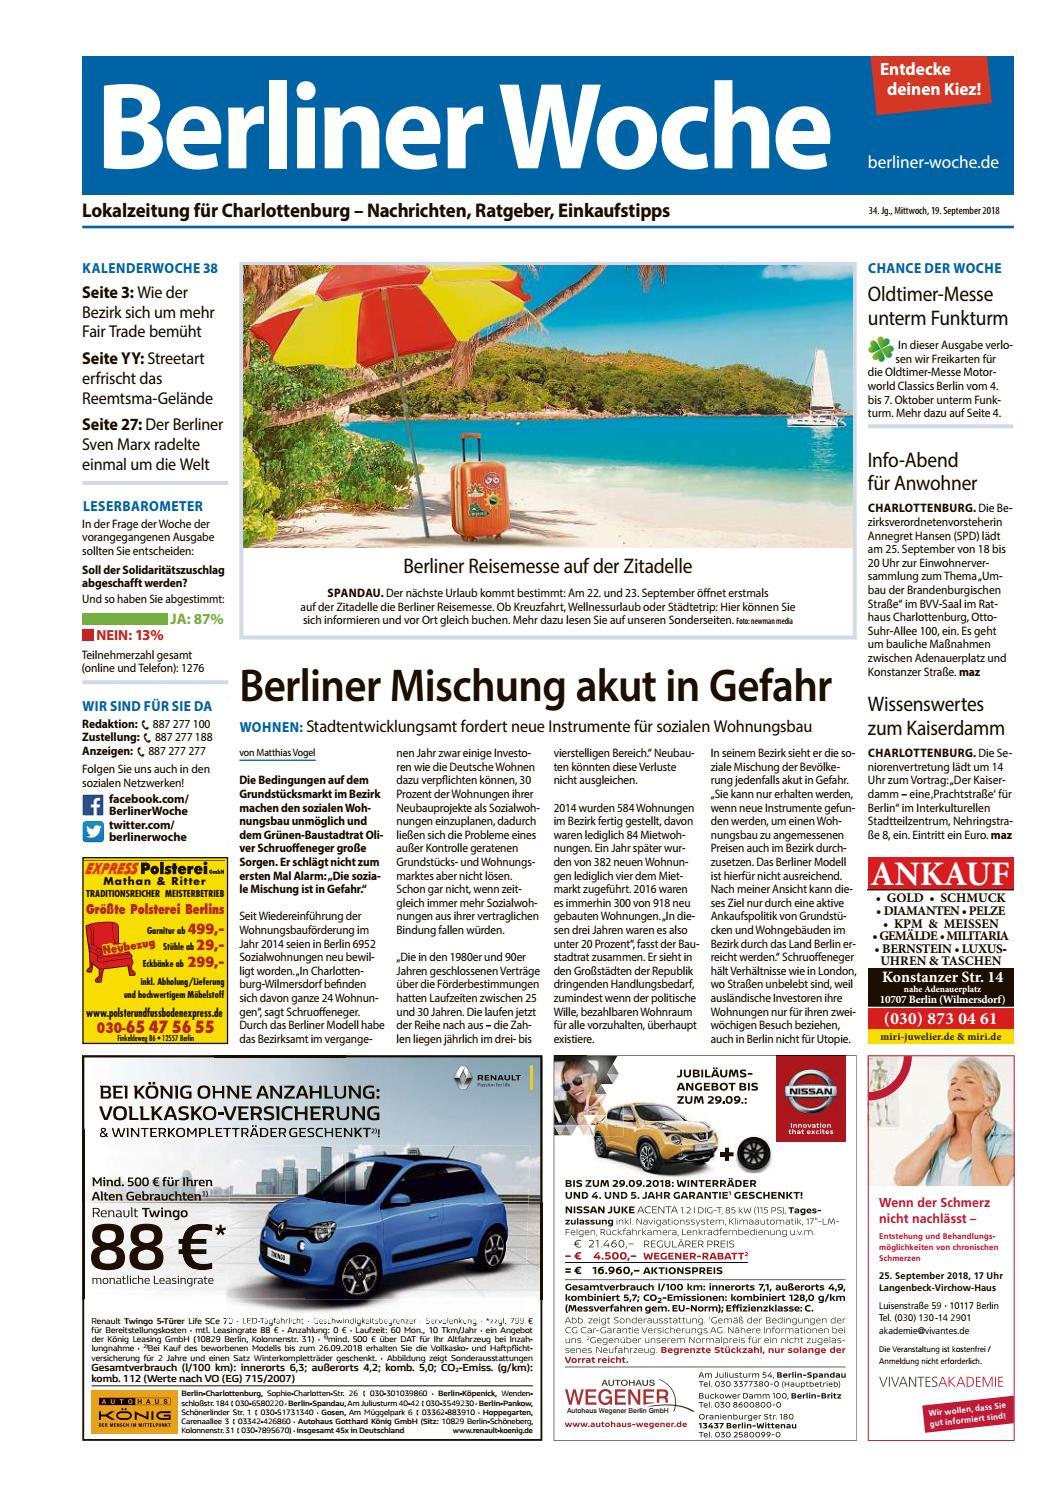 Car Kicker Stück 2,90€ Bild links 1x Deutschland  Auto Wackelfigur ca 12-18cm